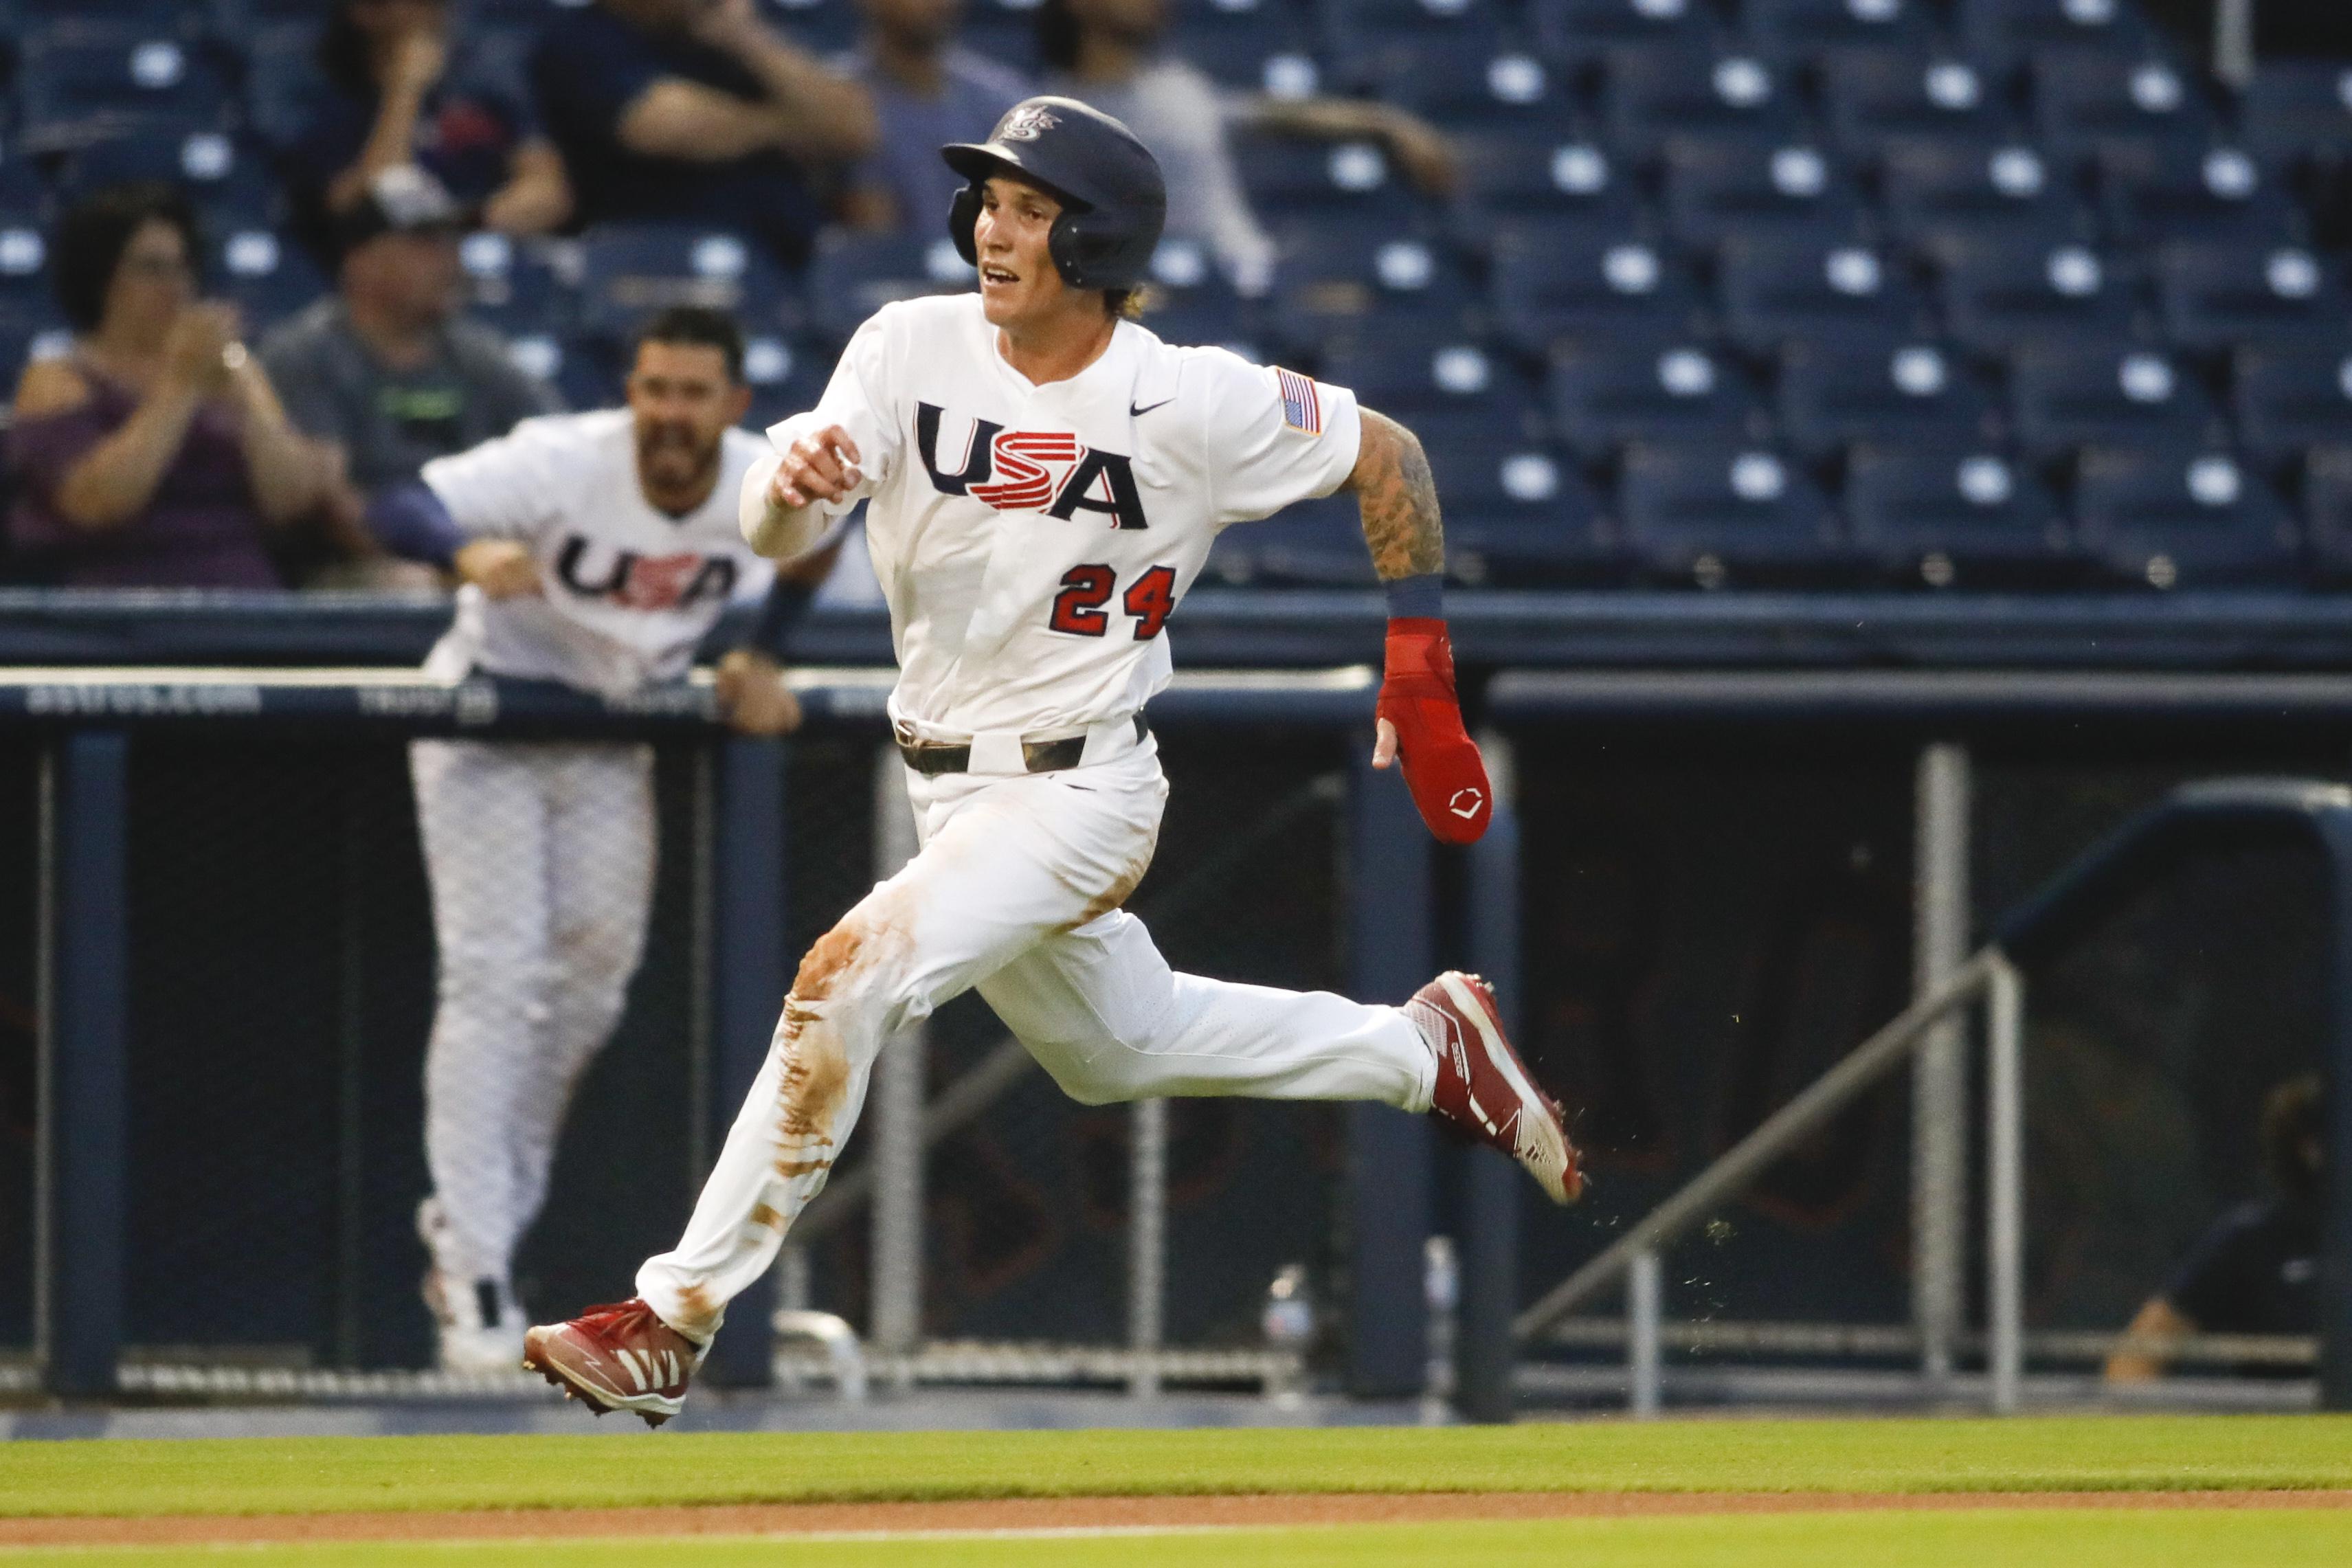 Baseball: WBSC Baseball Americas Qualifier-Canada at USA